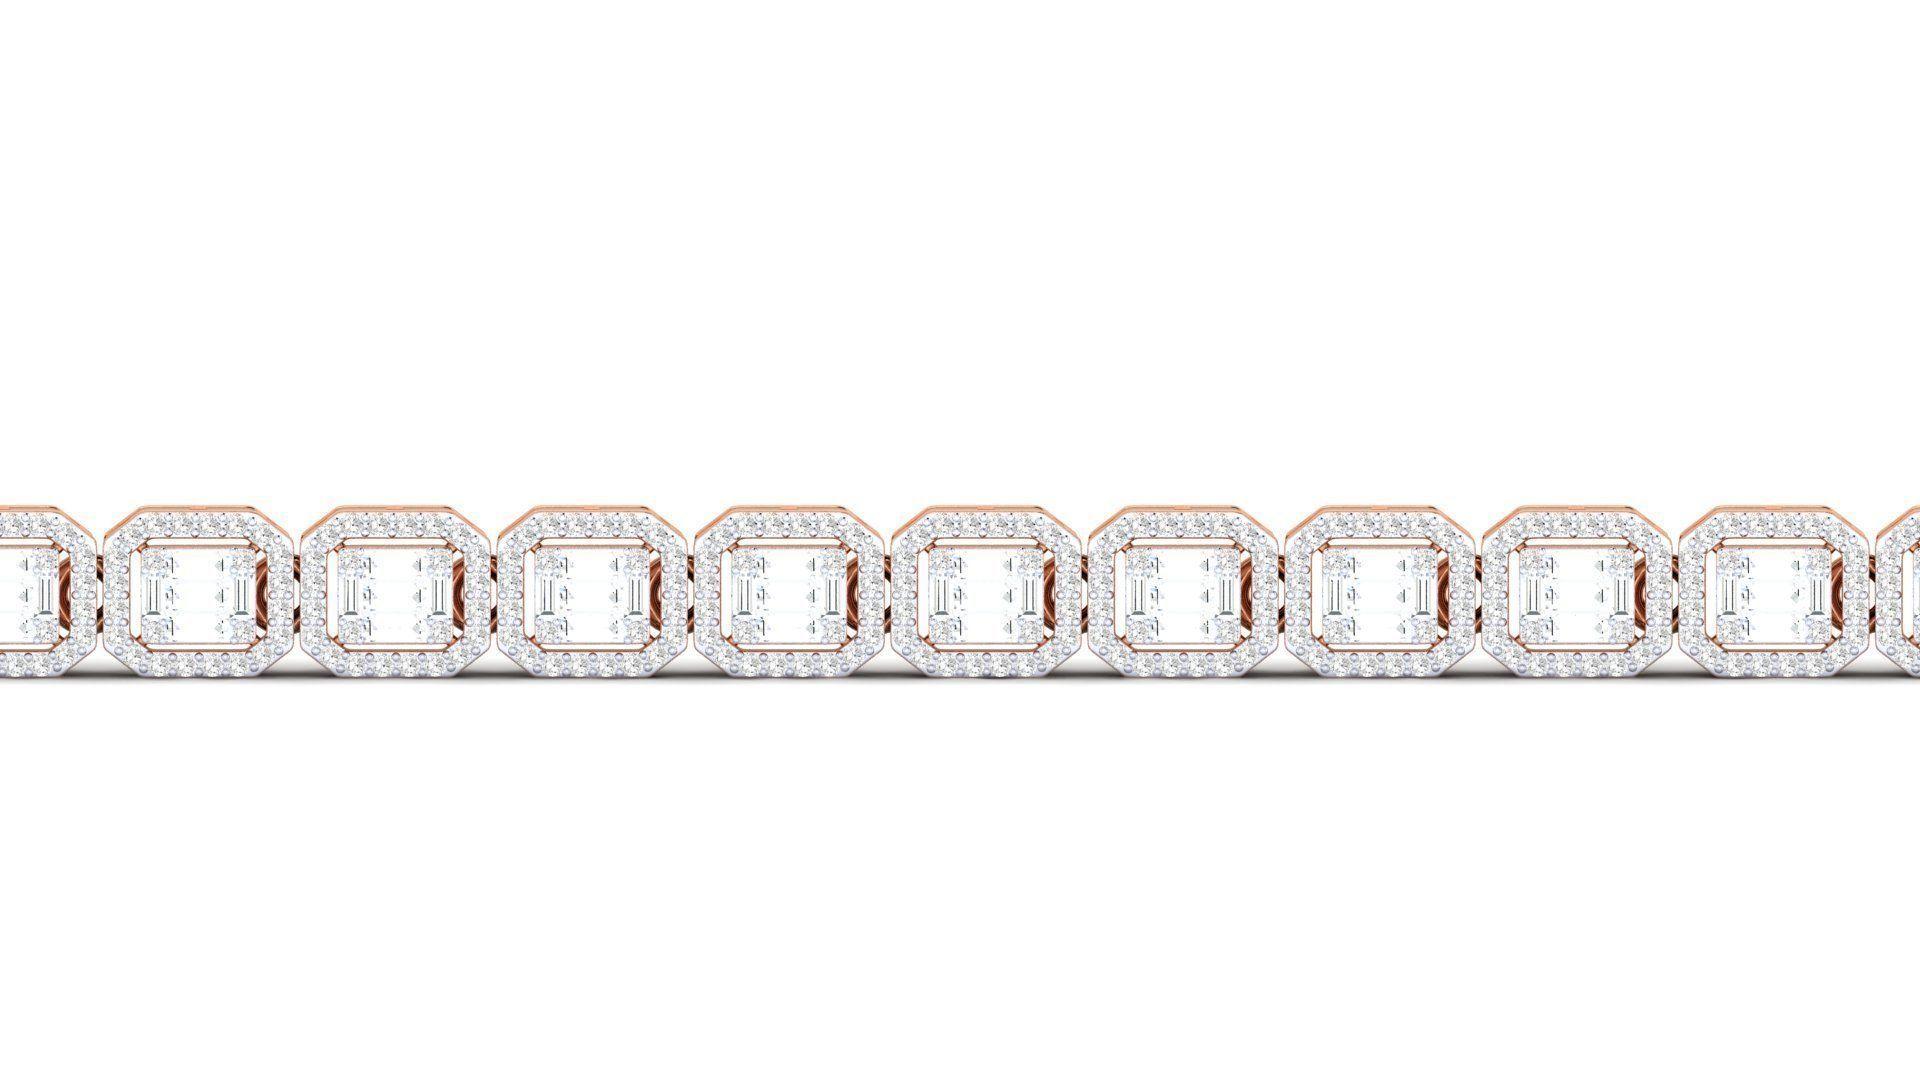 Women bracelet 3dm stl render detail